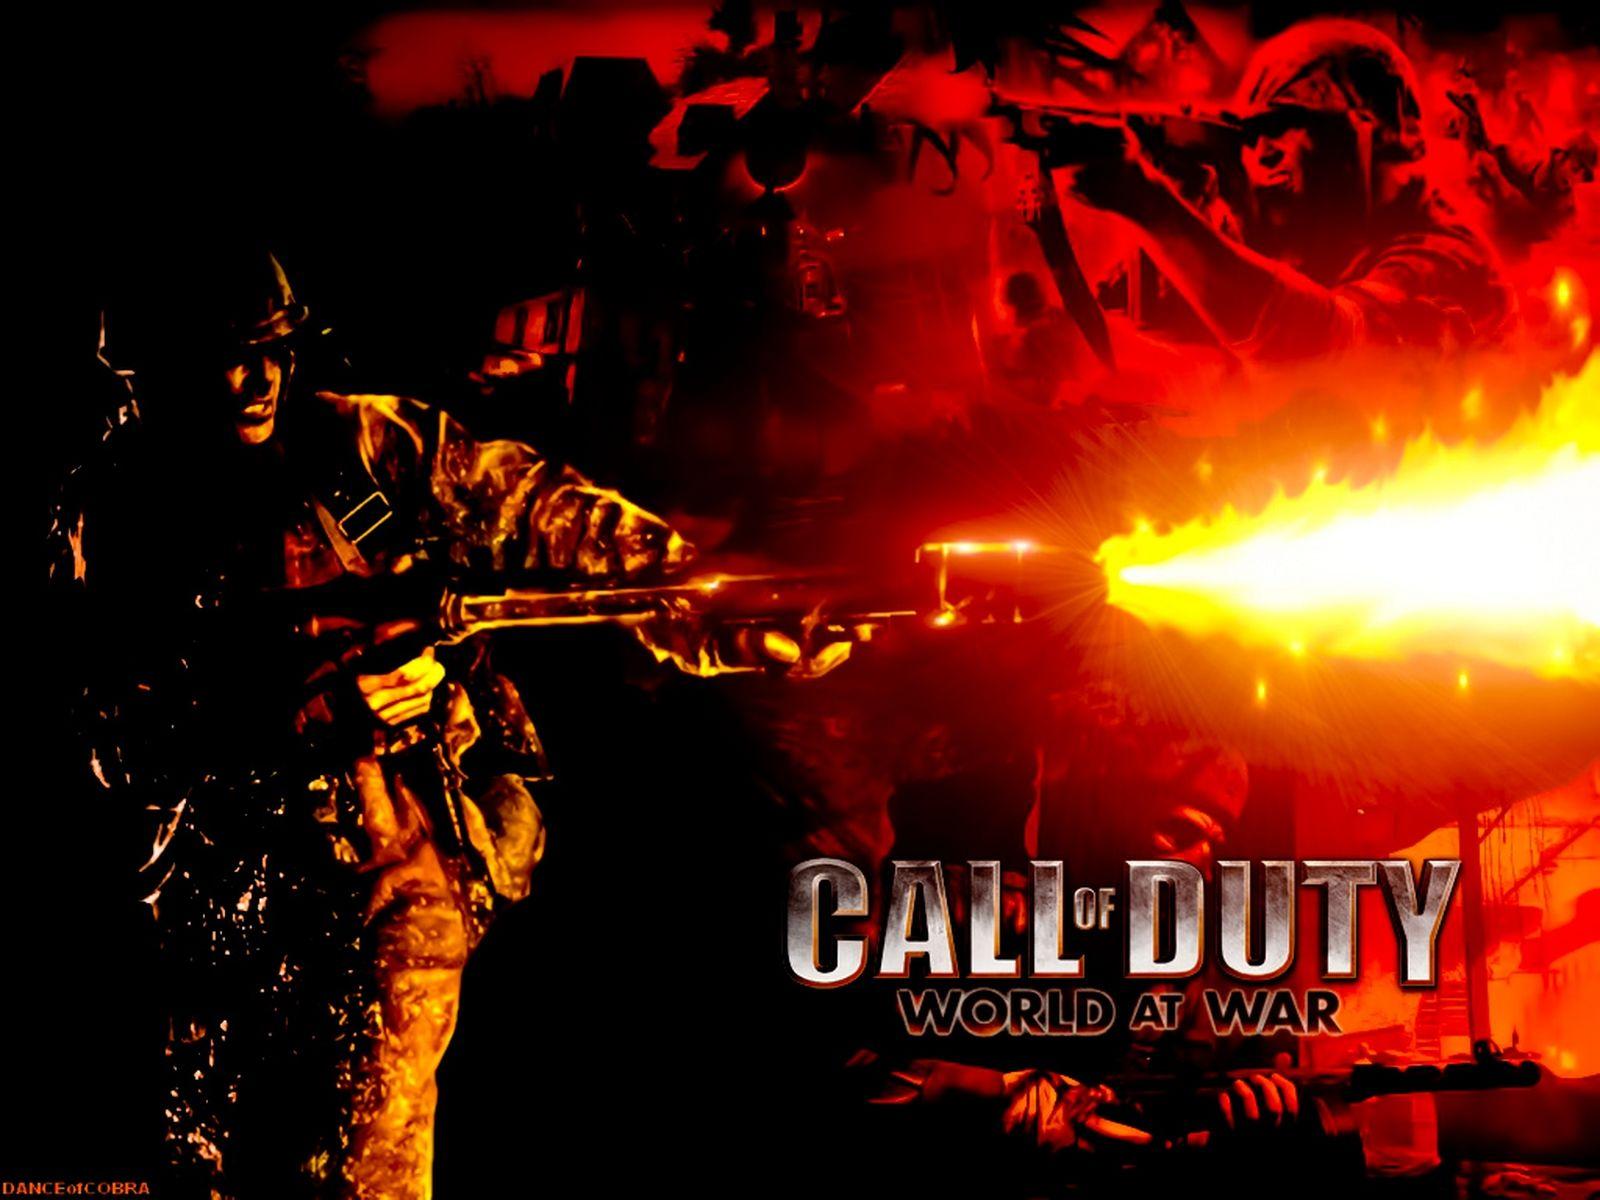 Call Of Duty World At War 1600x1200 Wallpaper Teahub Io